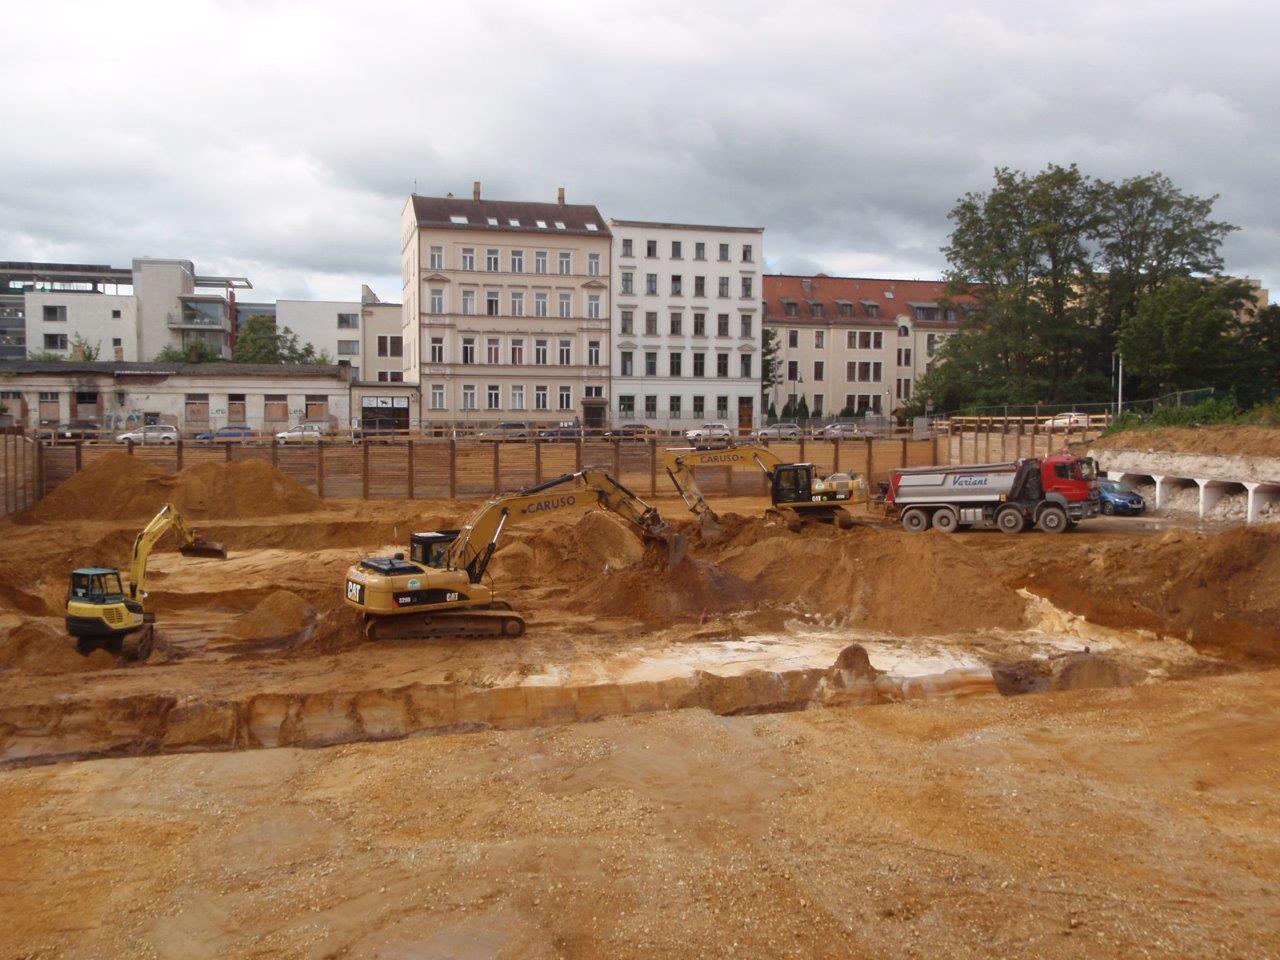 Bunkerabbruch schafft Platz auf dem Areal an der Goldschmidtstraße